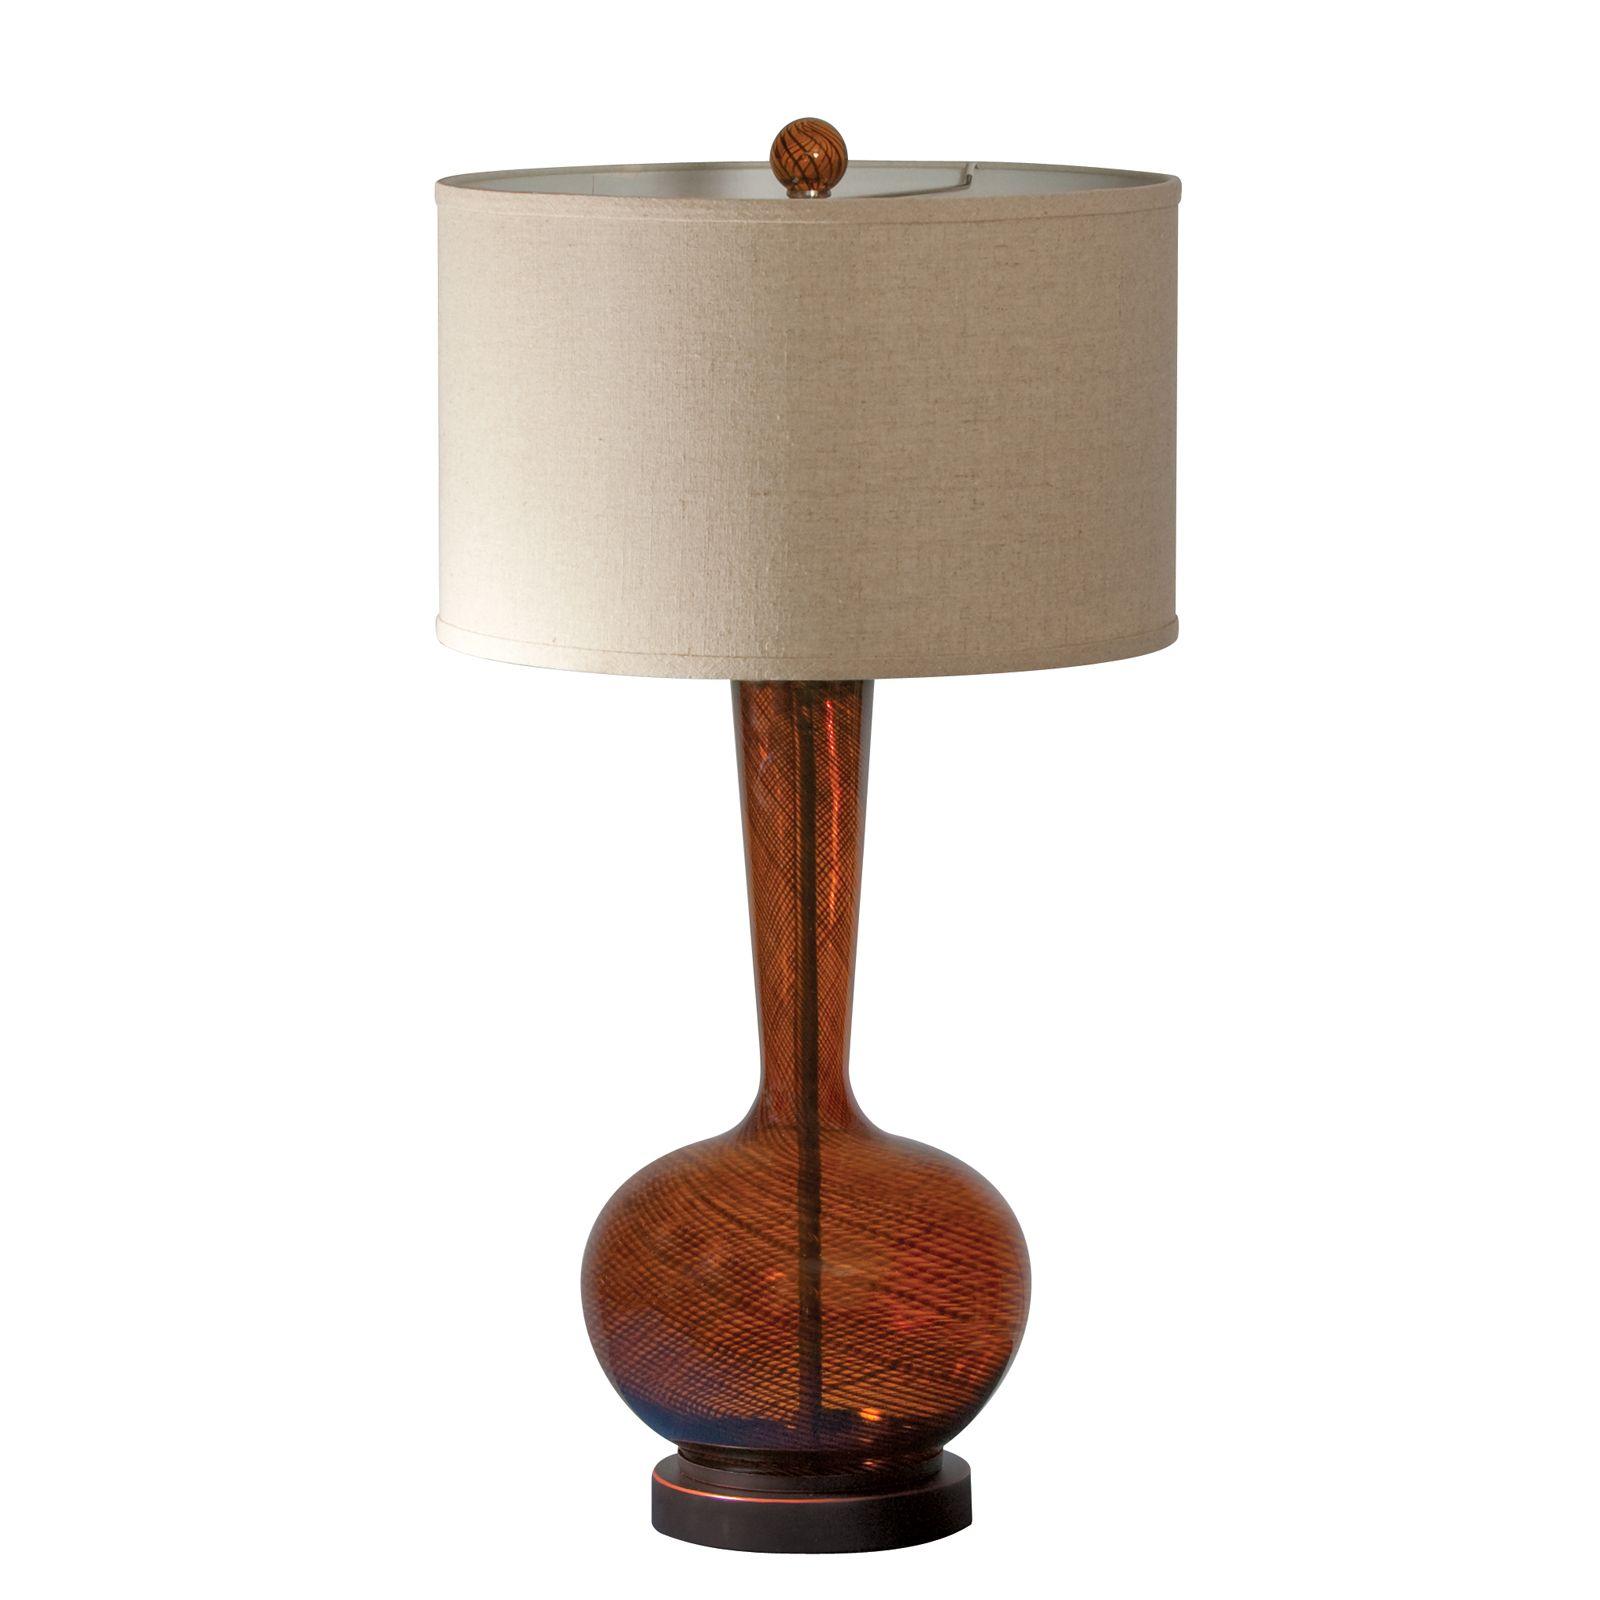 Fitzgerald table lamp indoor living pinterest linens fitzgerald table lamp glass table lampscandice olsonlight aloadofball Gallery